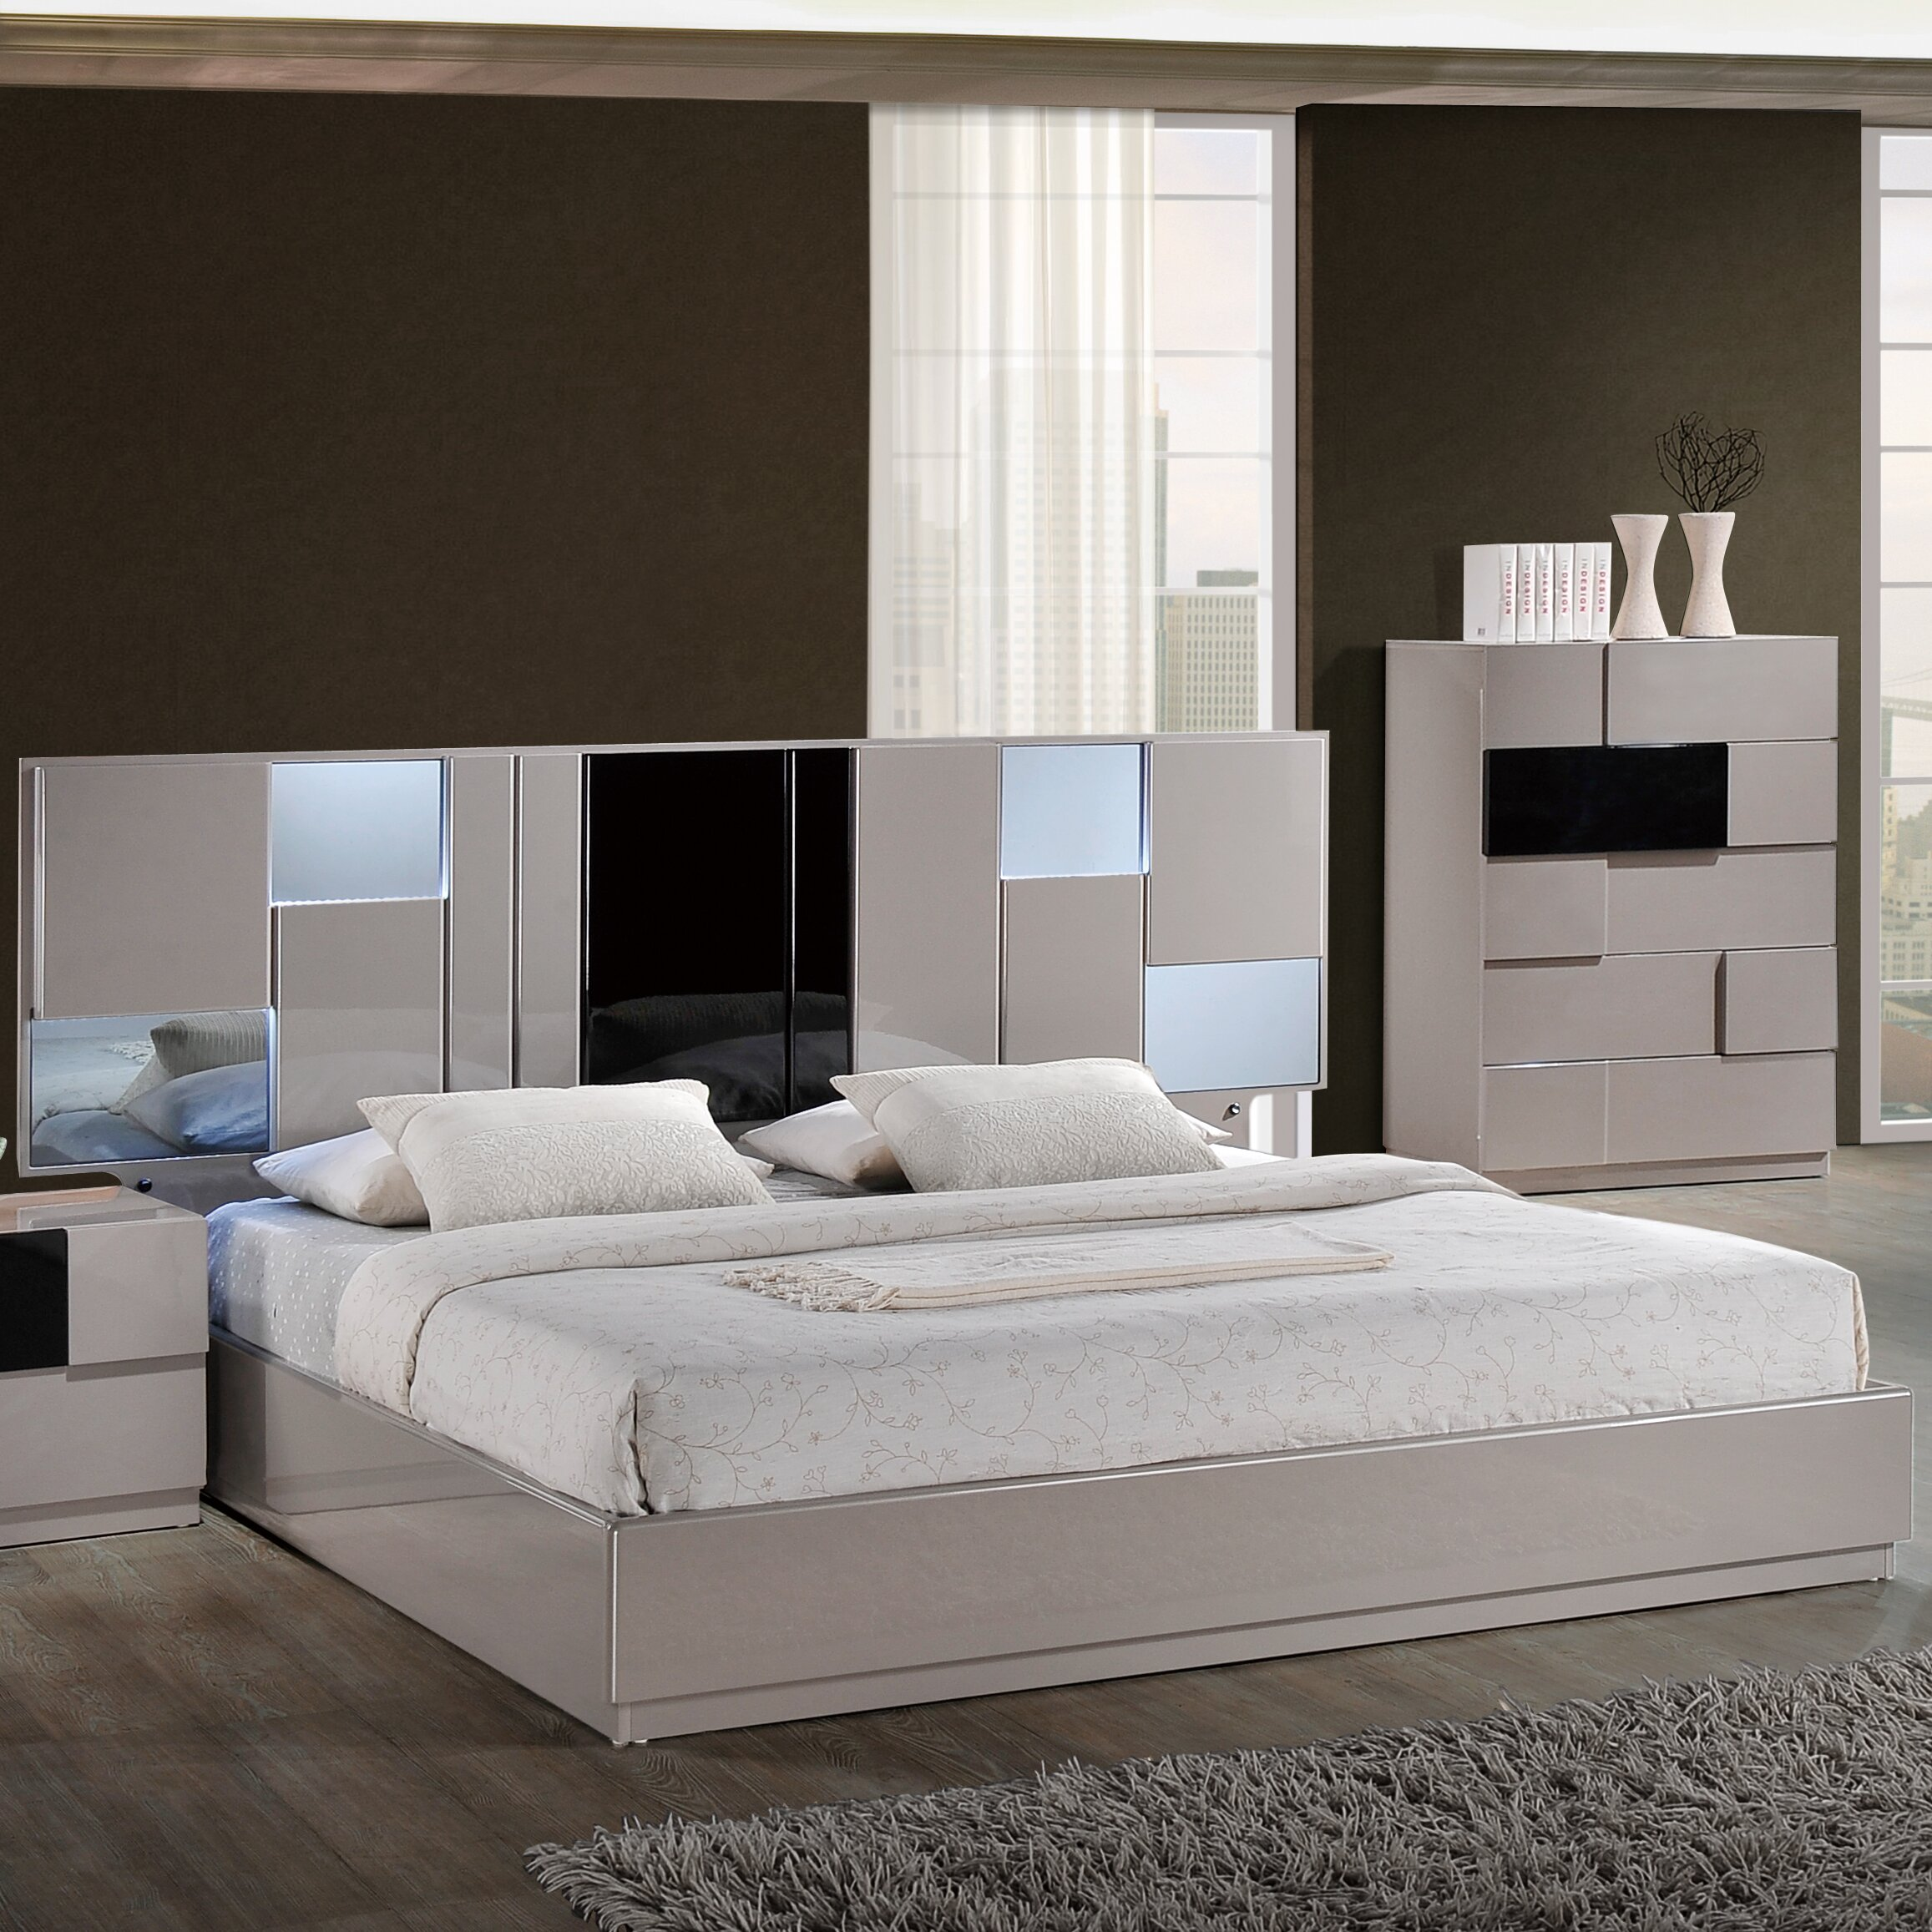 global furniture usa bianca panel customizable bedroom set